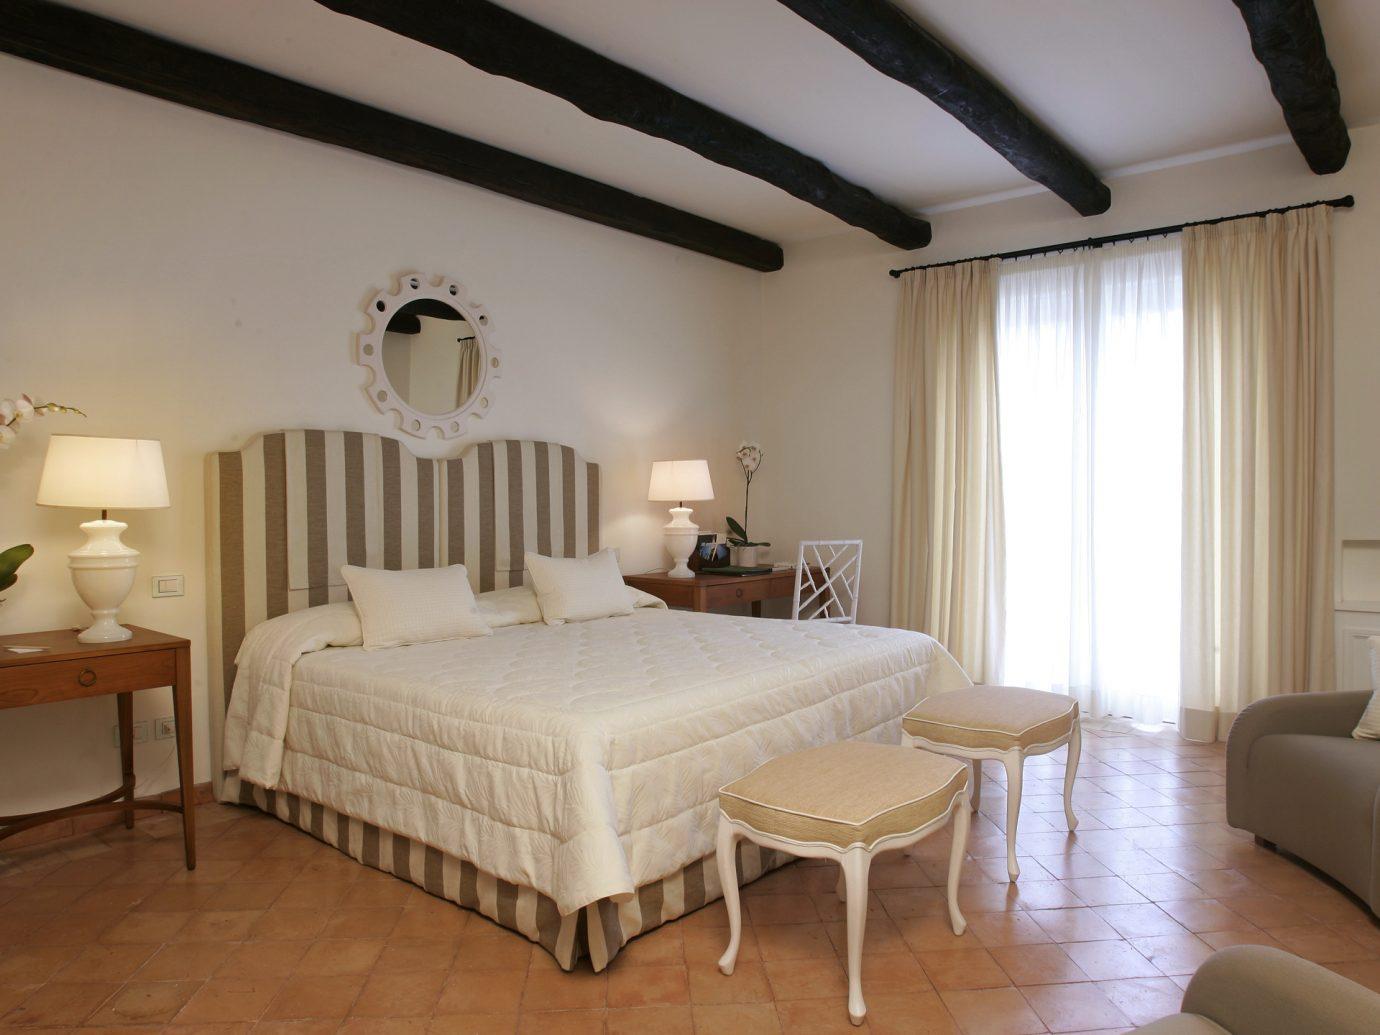 Bedroom at Il Pellicano